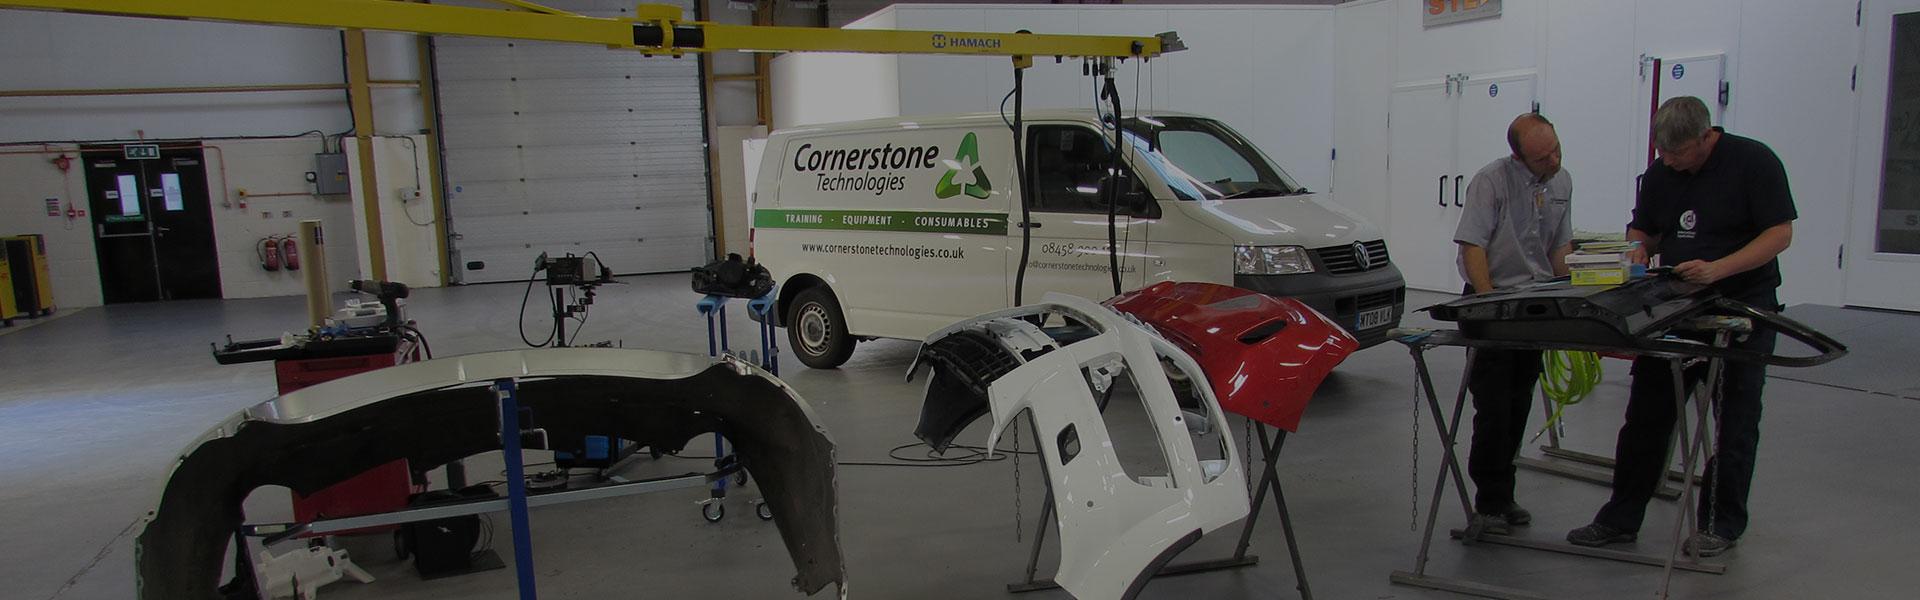 Welcome to Cornerstone Technologies